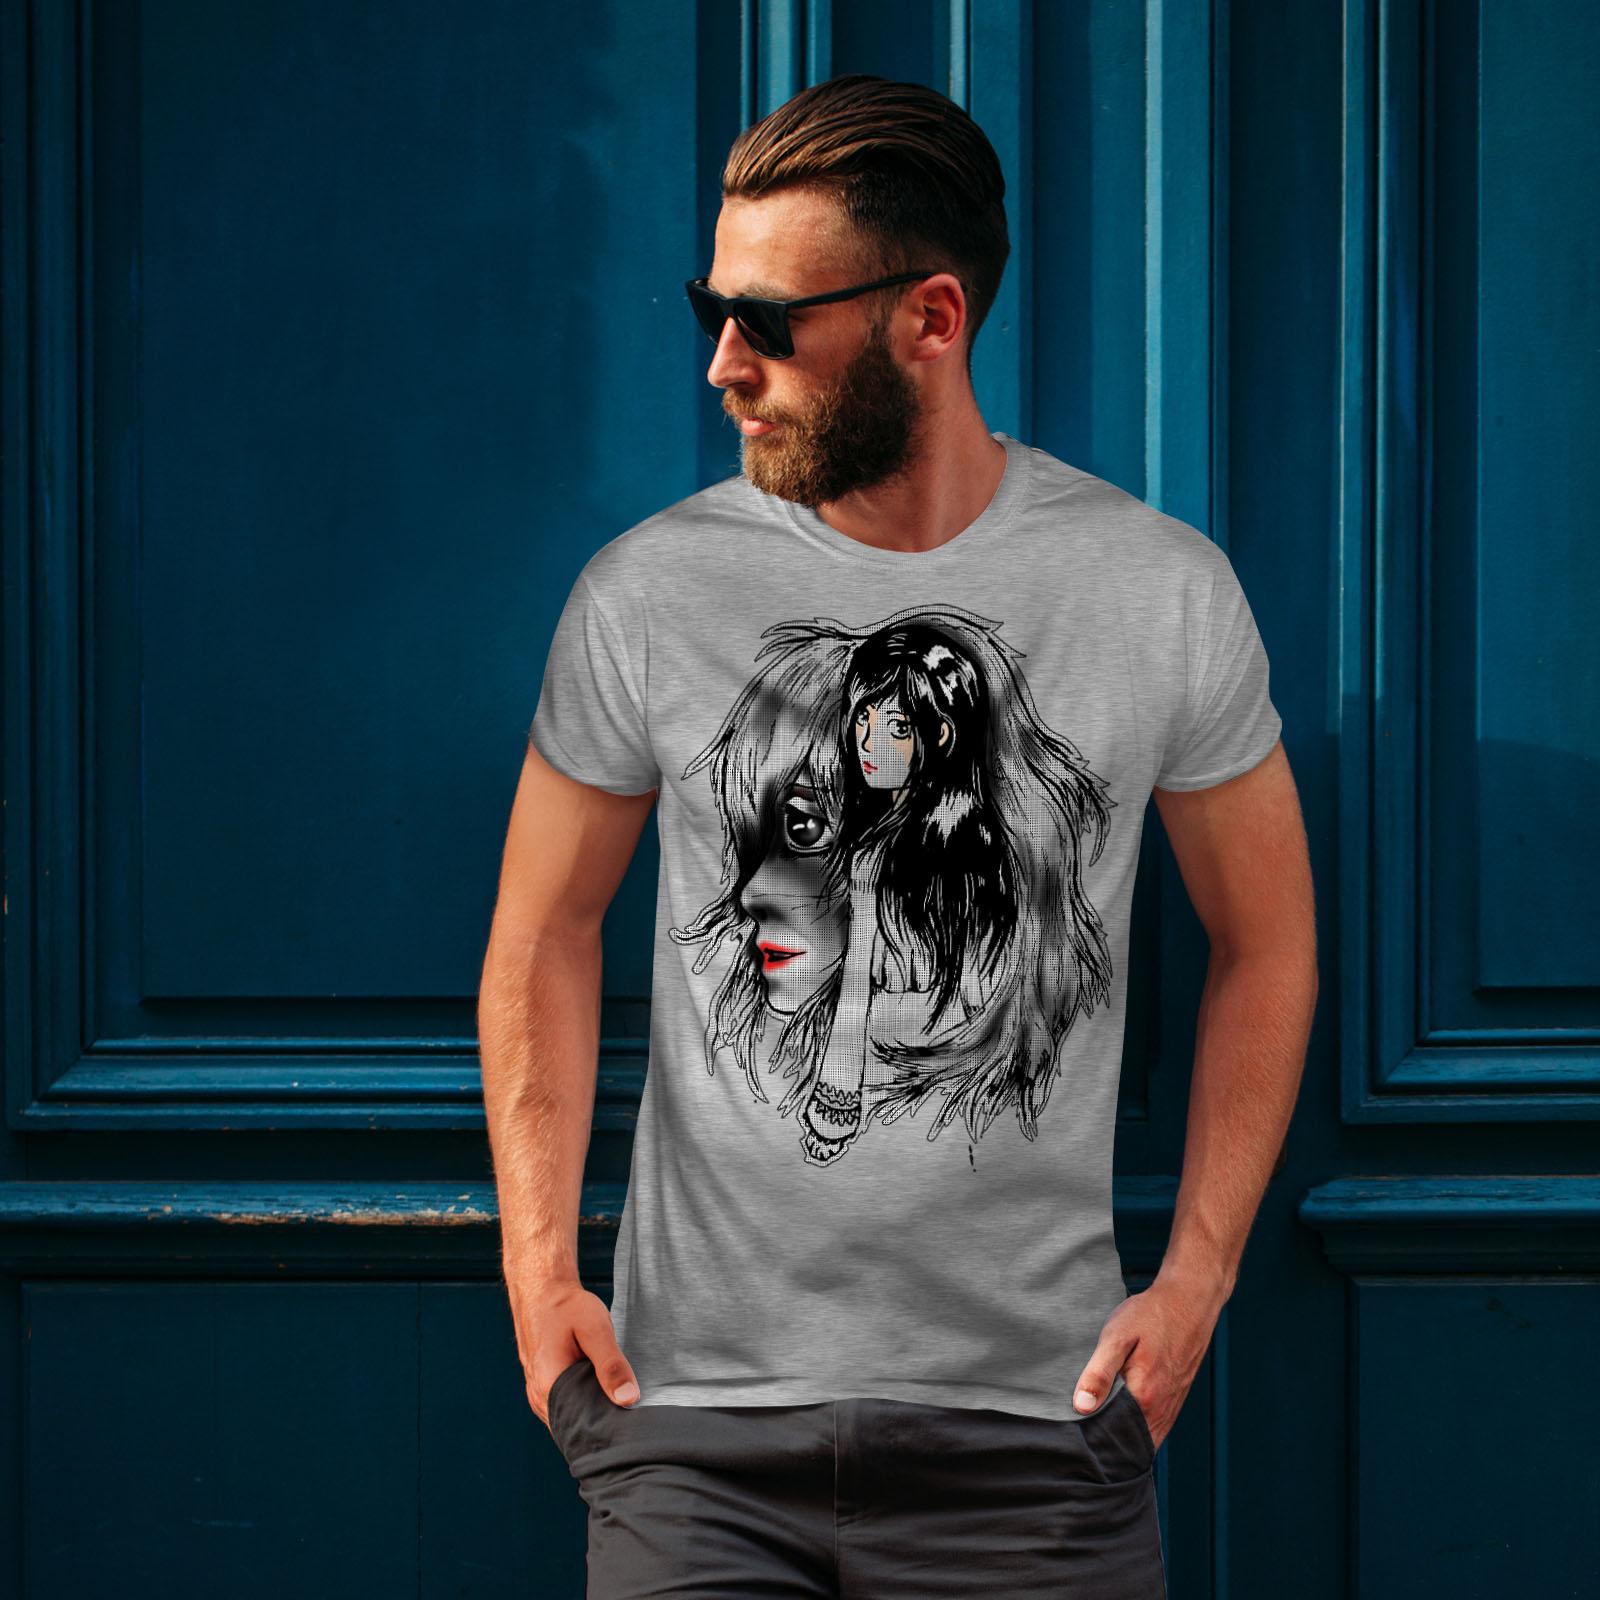 Wellcoda-bellissime-ANIME-Da-Uomo-T-shirt-misterioso-design-grafico-stampato-T-shirt miniatura 16